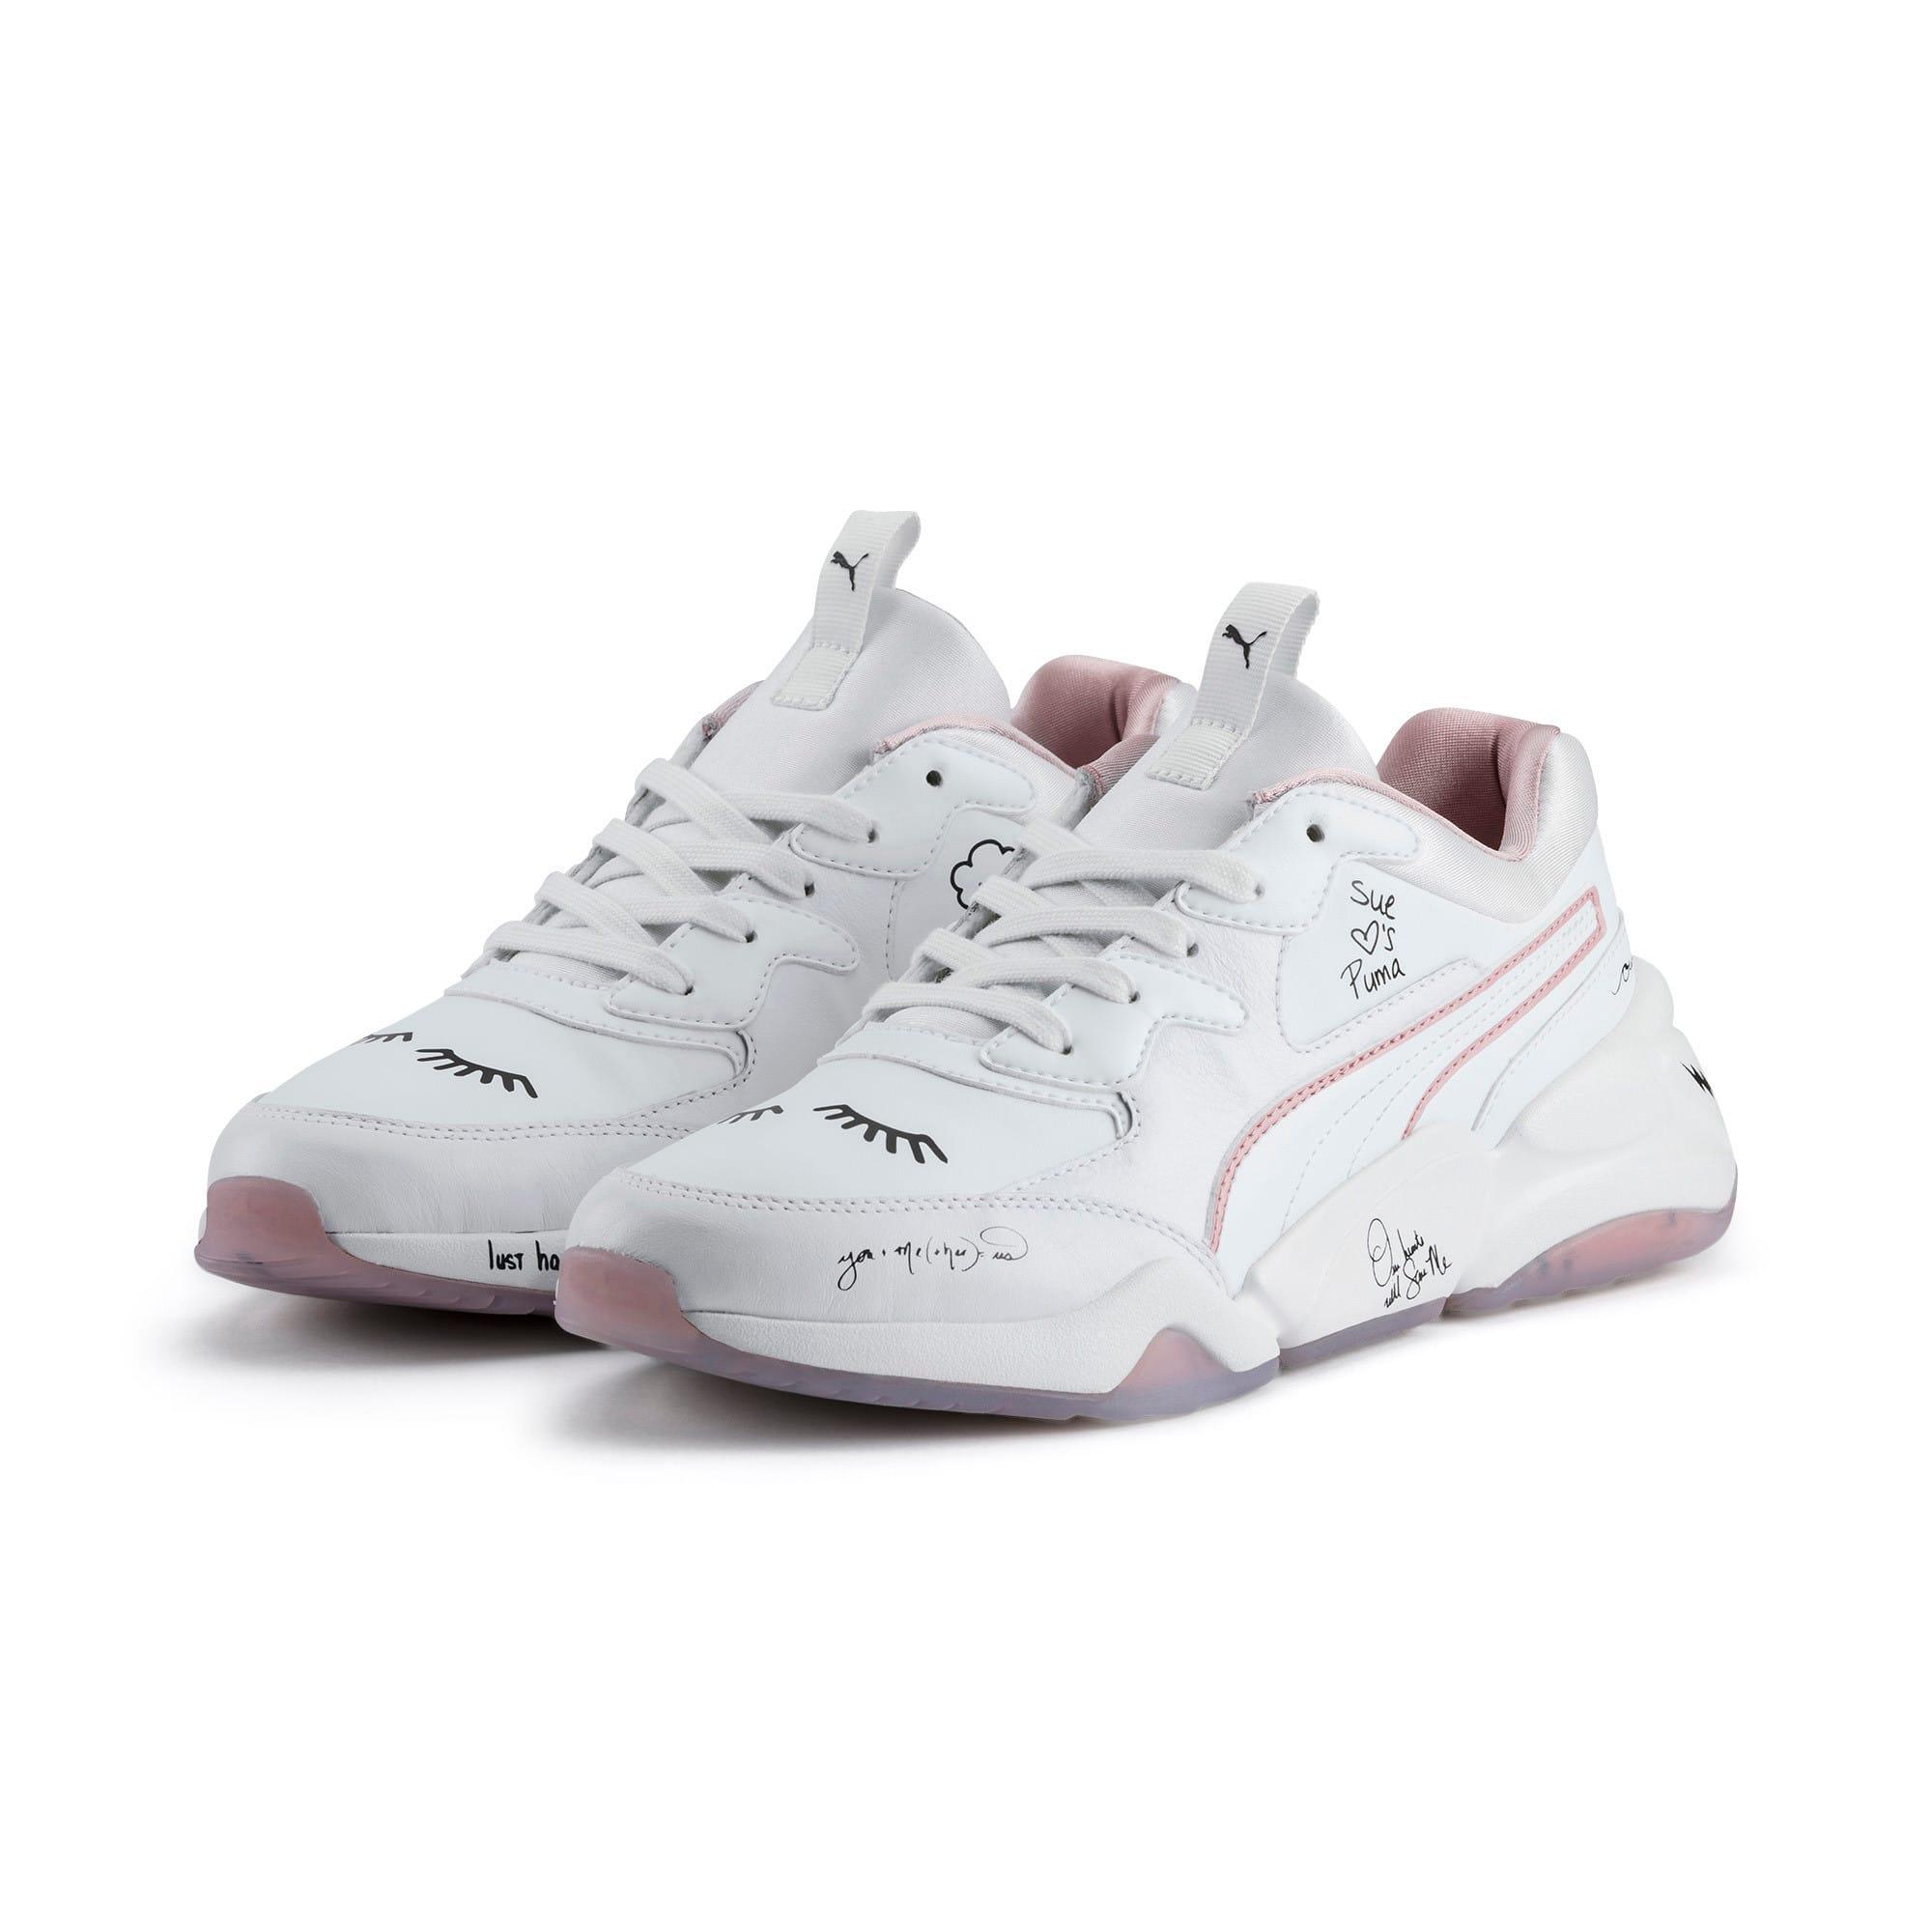 Thumbnail 2 of PUMA x SUE TSAI Nova Women's Sneakers, Bright White-Bright White, medium